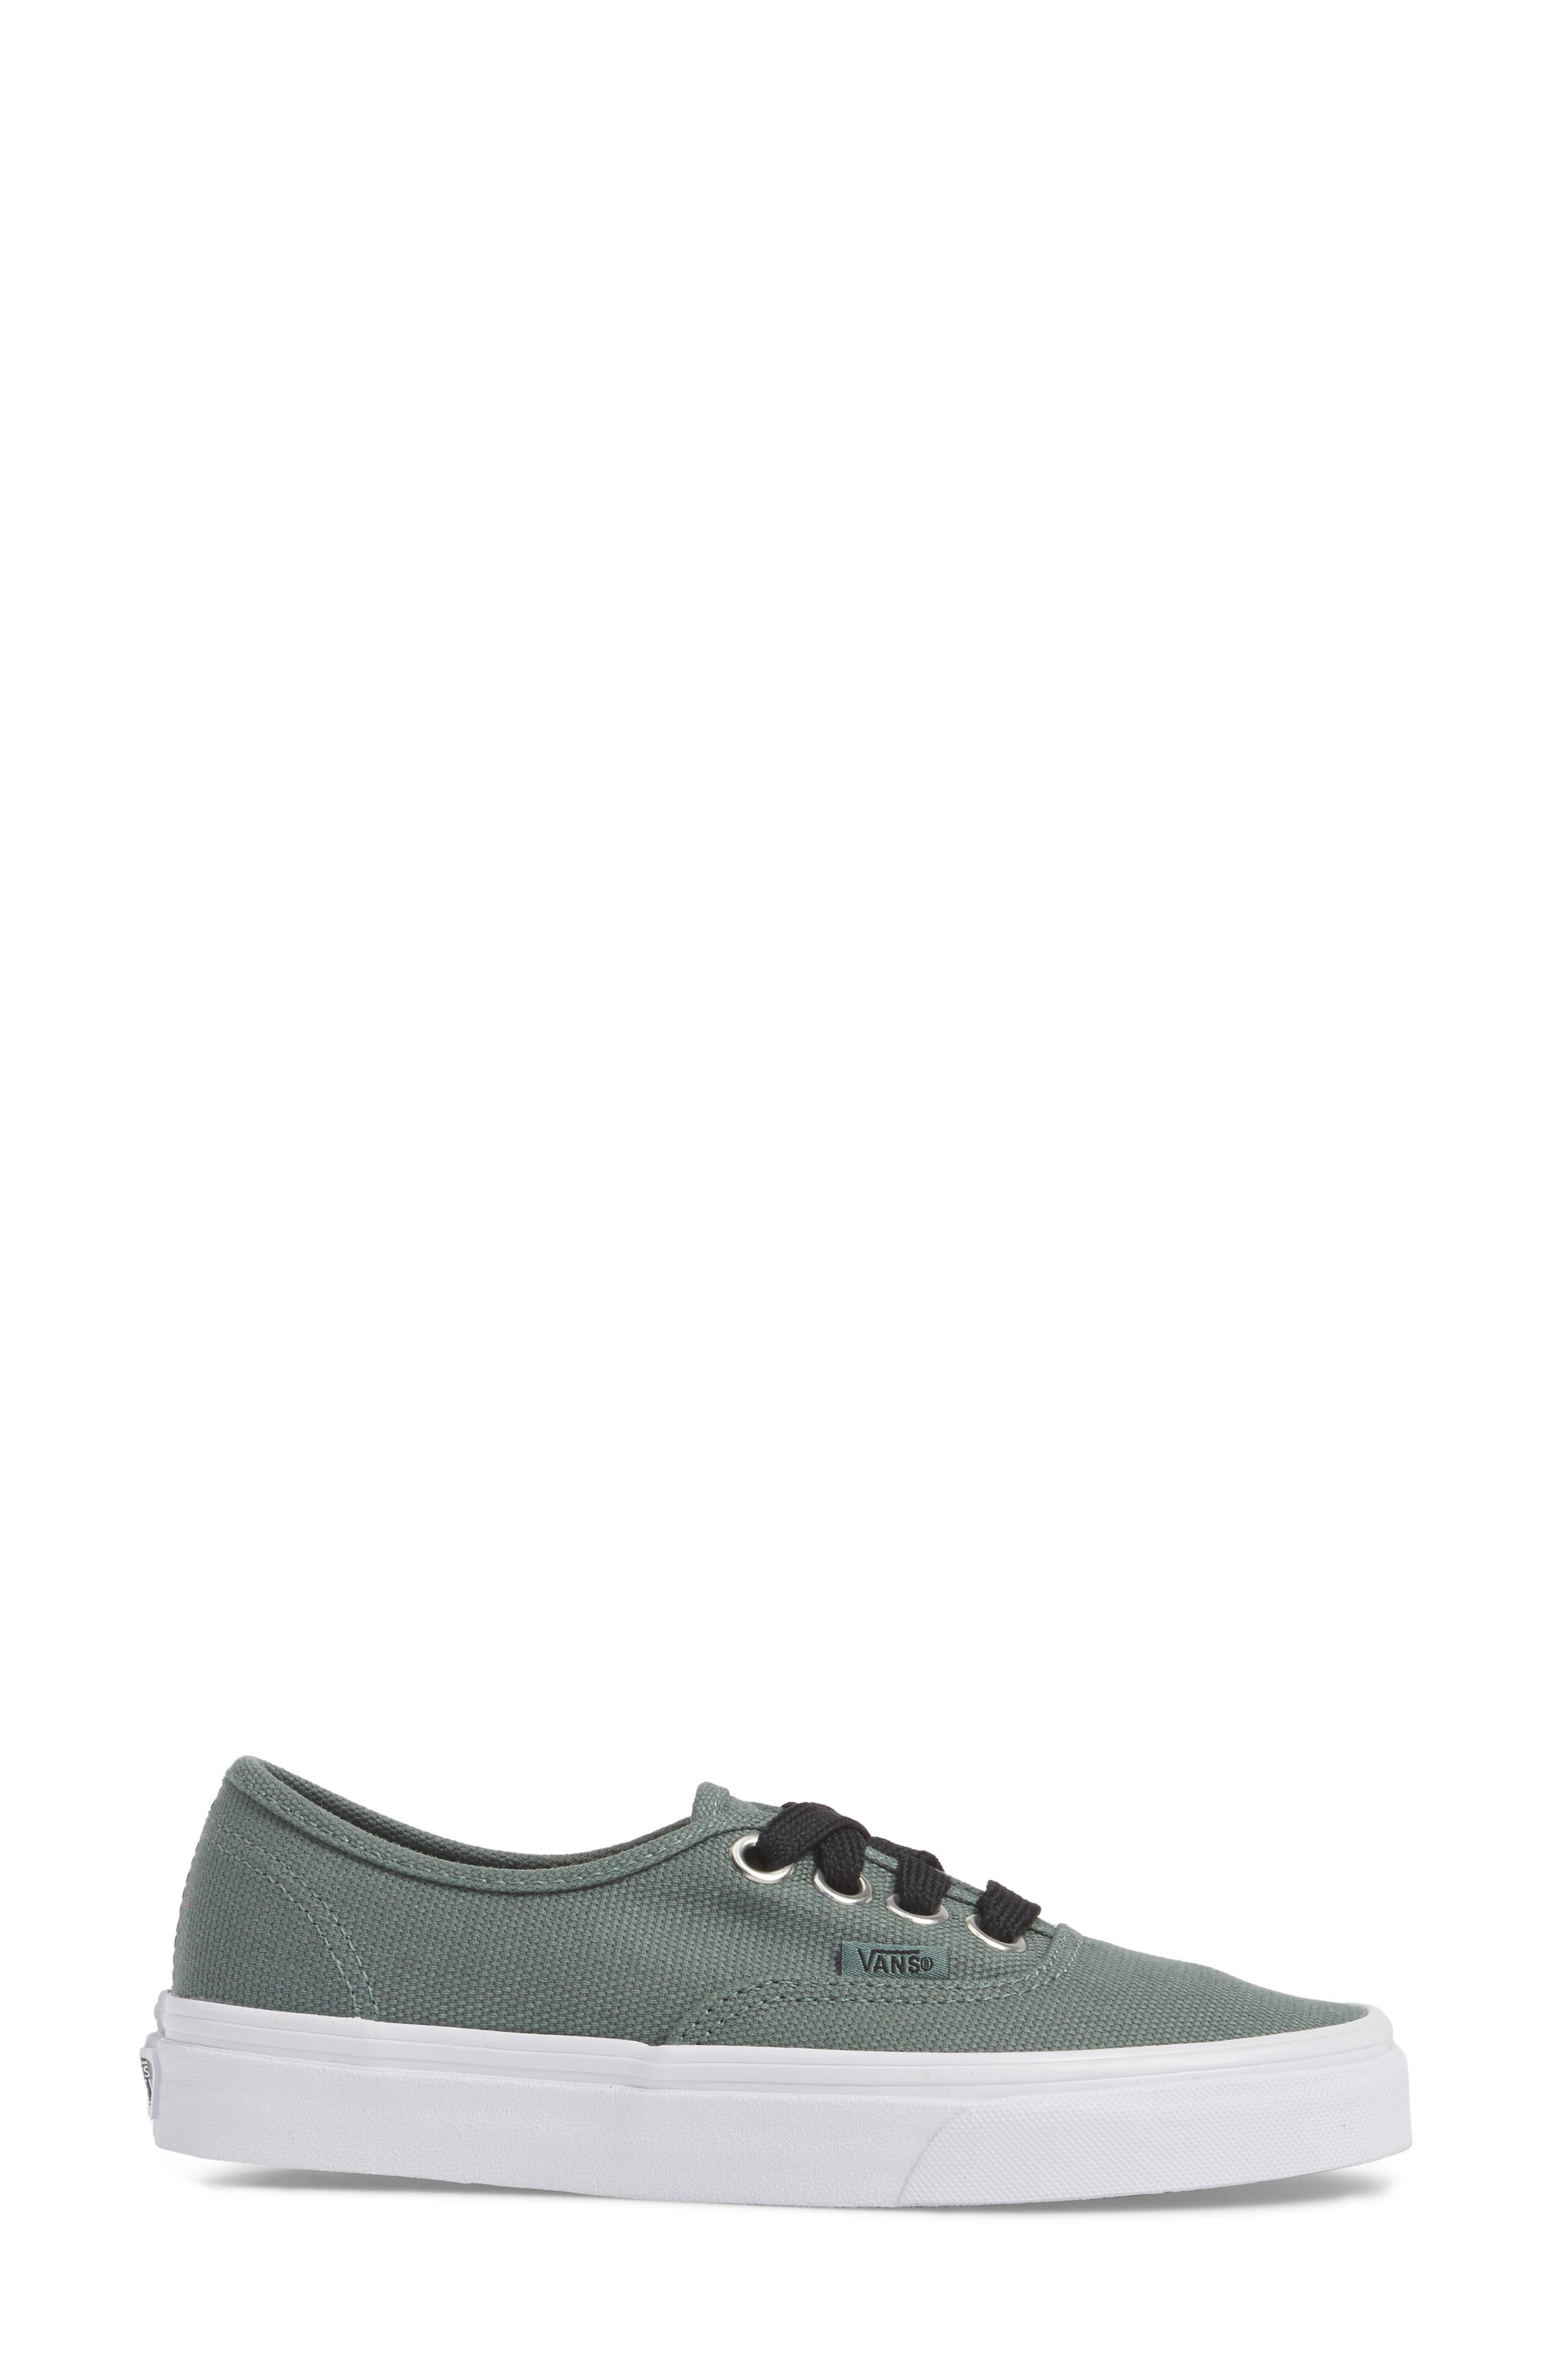 ,                             'Authentic' Sneaker,                             Alternate thumbnail 264, color,                             304